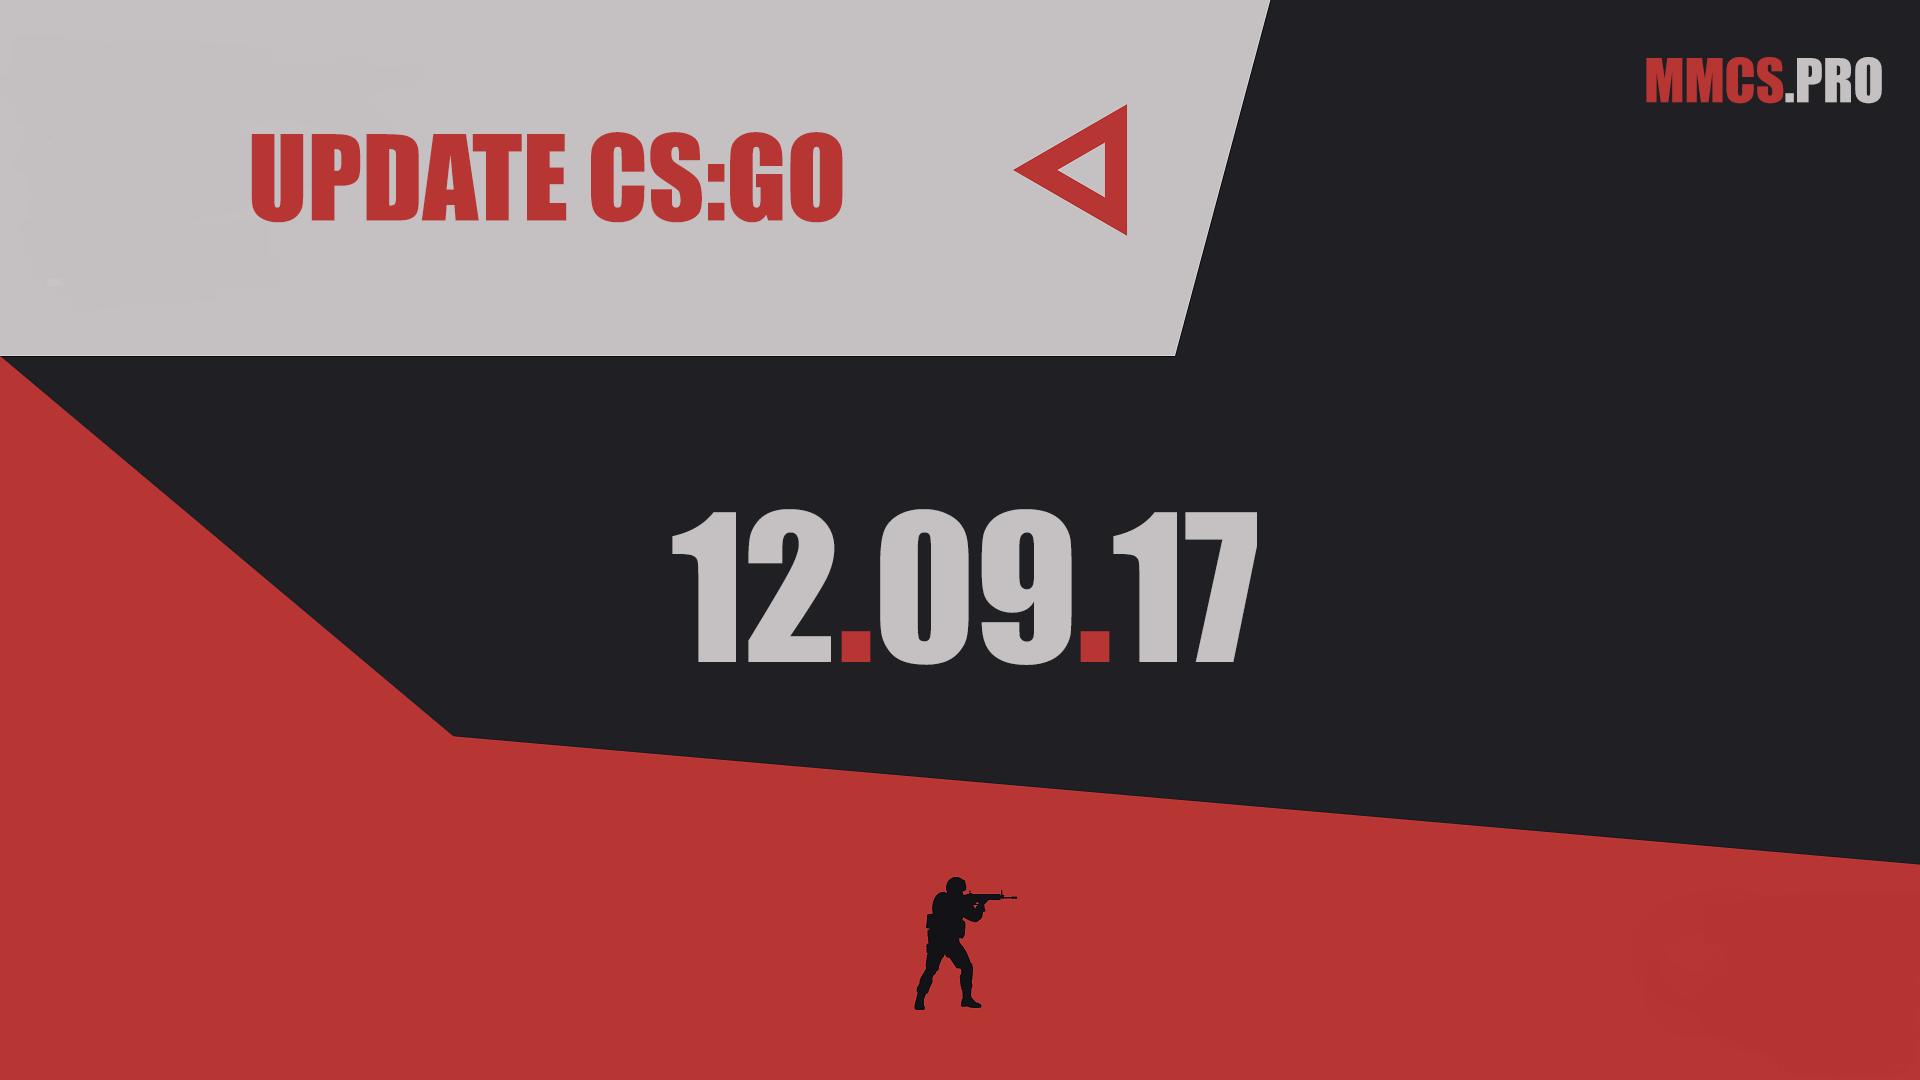 https://mmcs.pro/update-csgo-12-09-2017-valve/